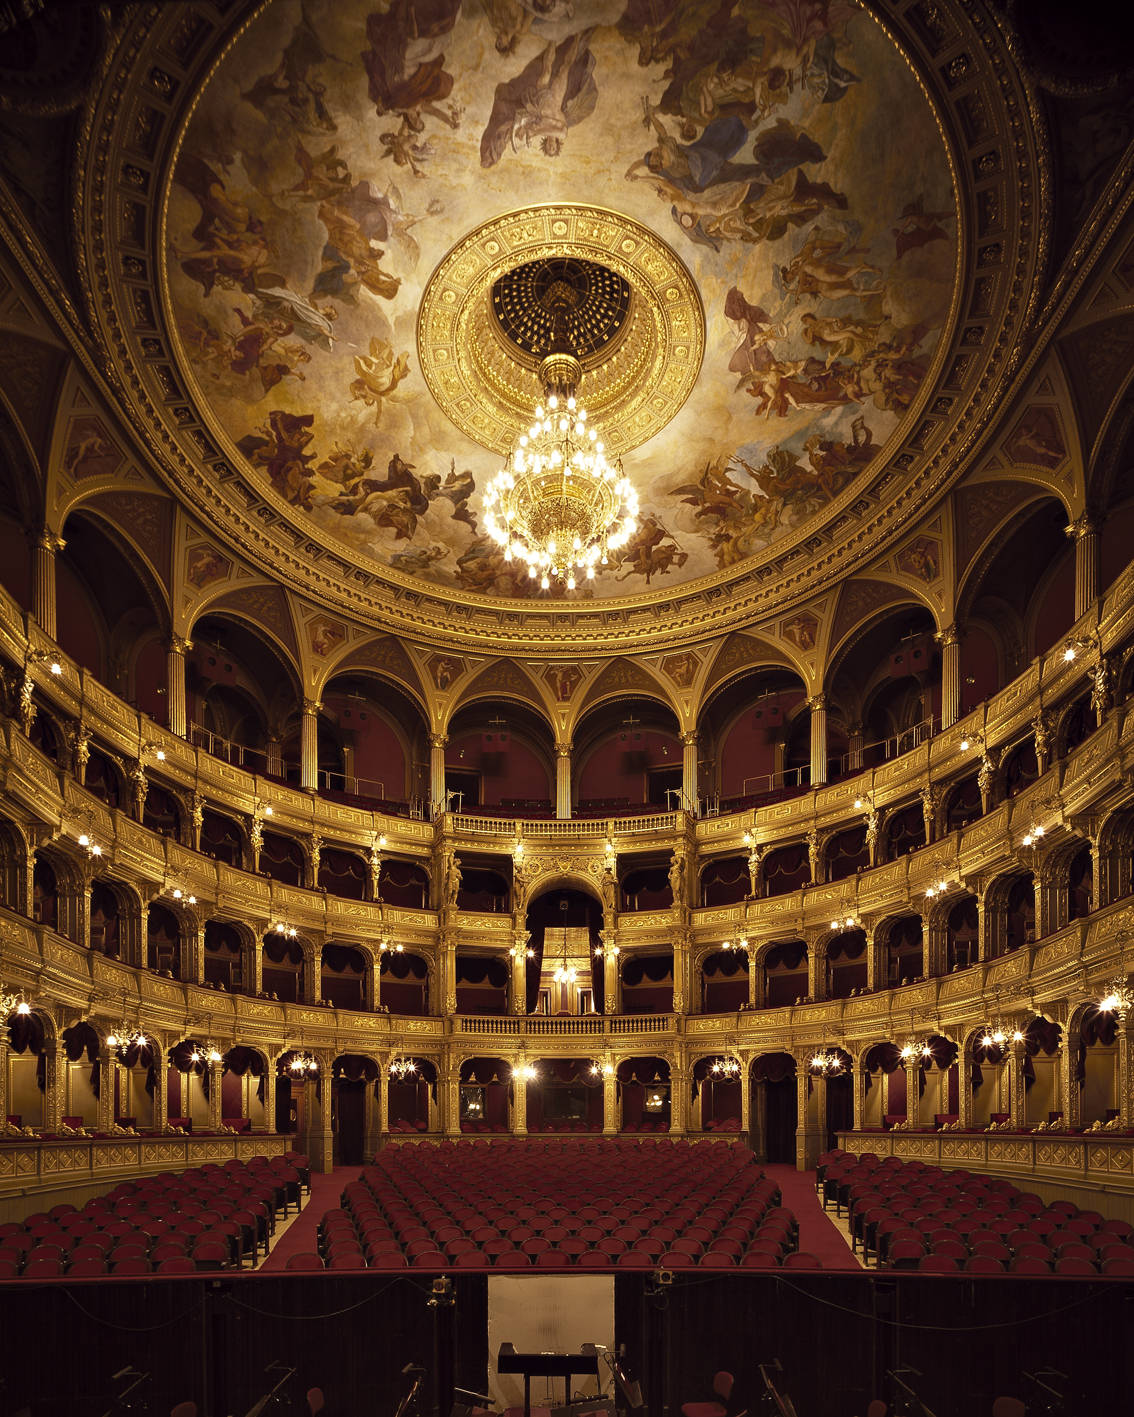 Vienna opera house images